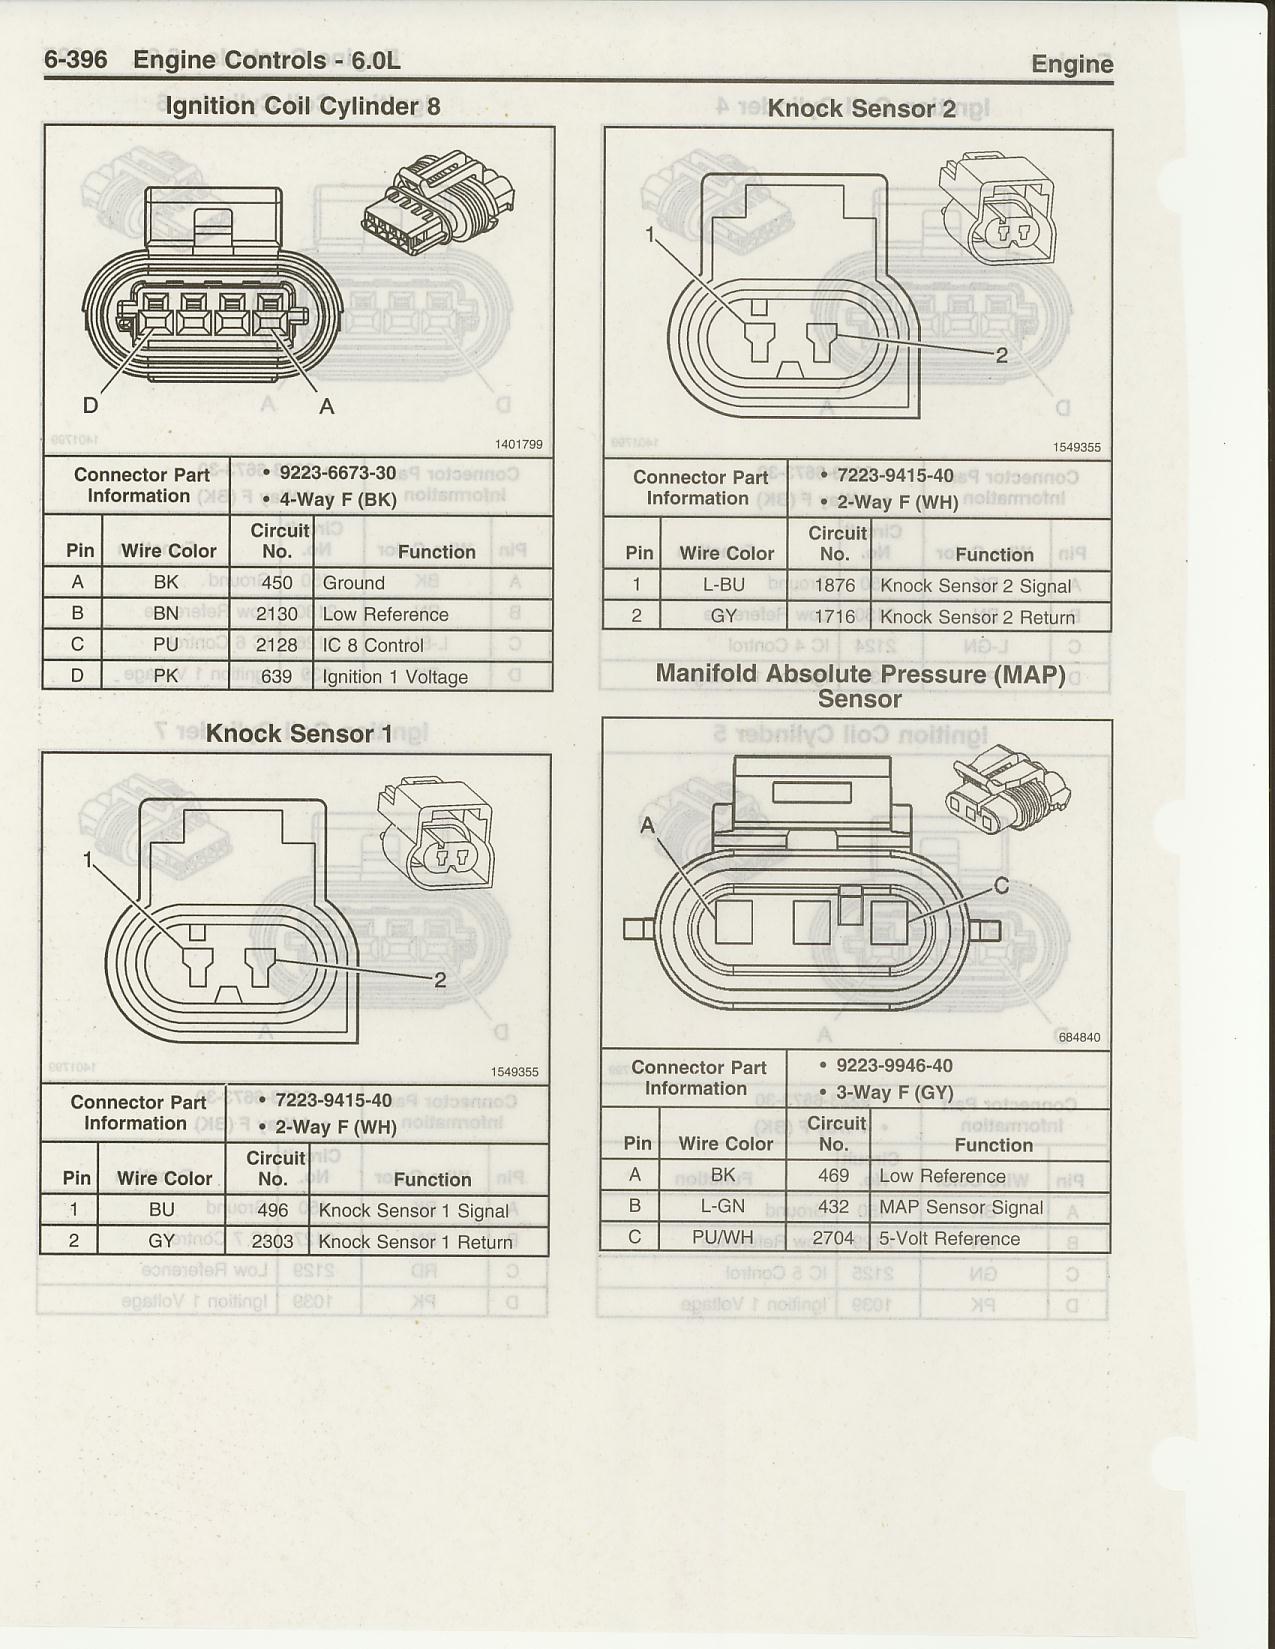 ipf wiring diagram manual transfer switch 1991 pontiac firebird for lights get